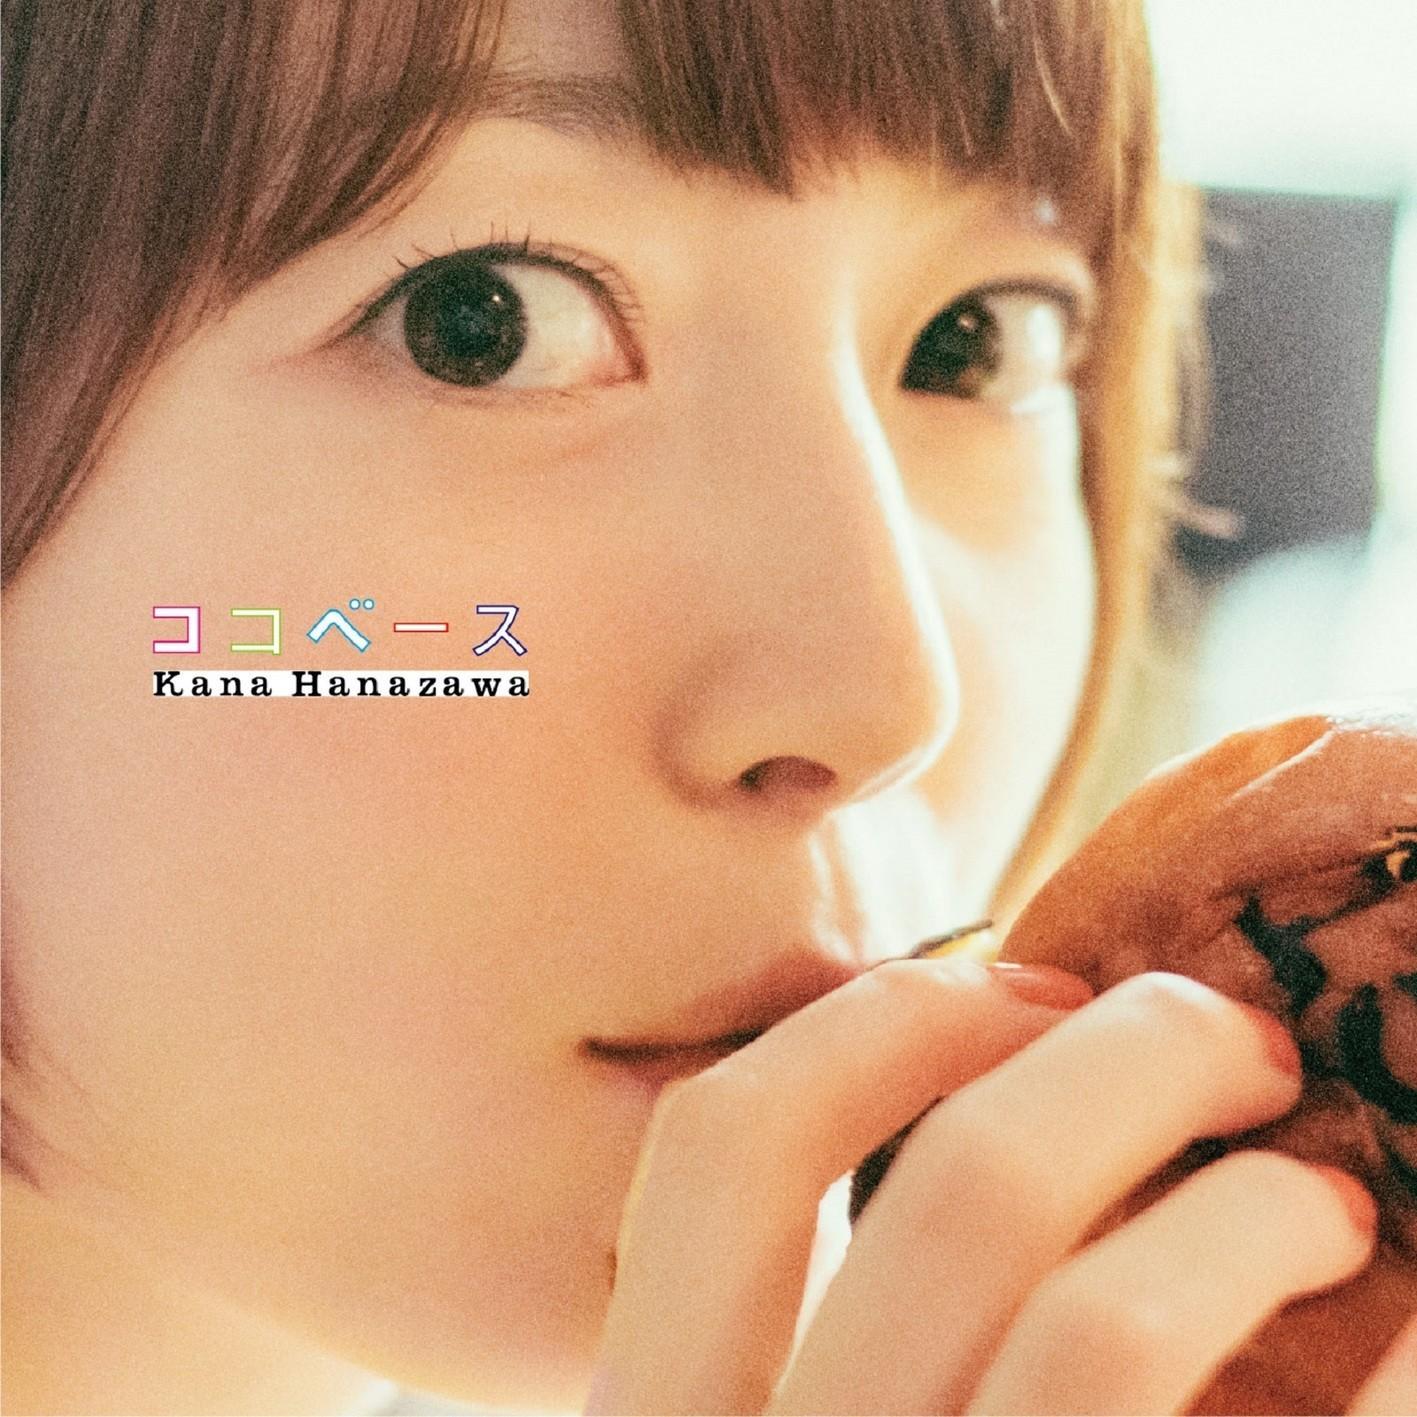 花澤香菜 (Kana Hanazawa) – ココベース [Mora FLAC 24bit/96kHz]